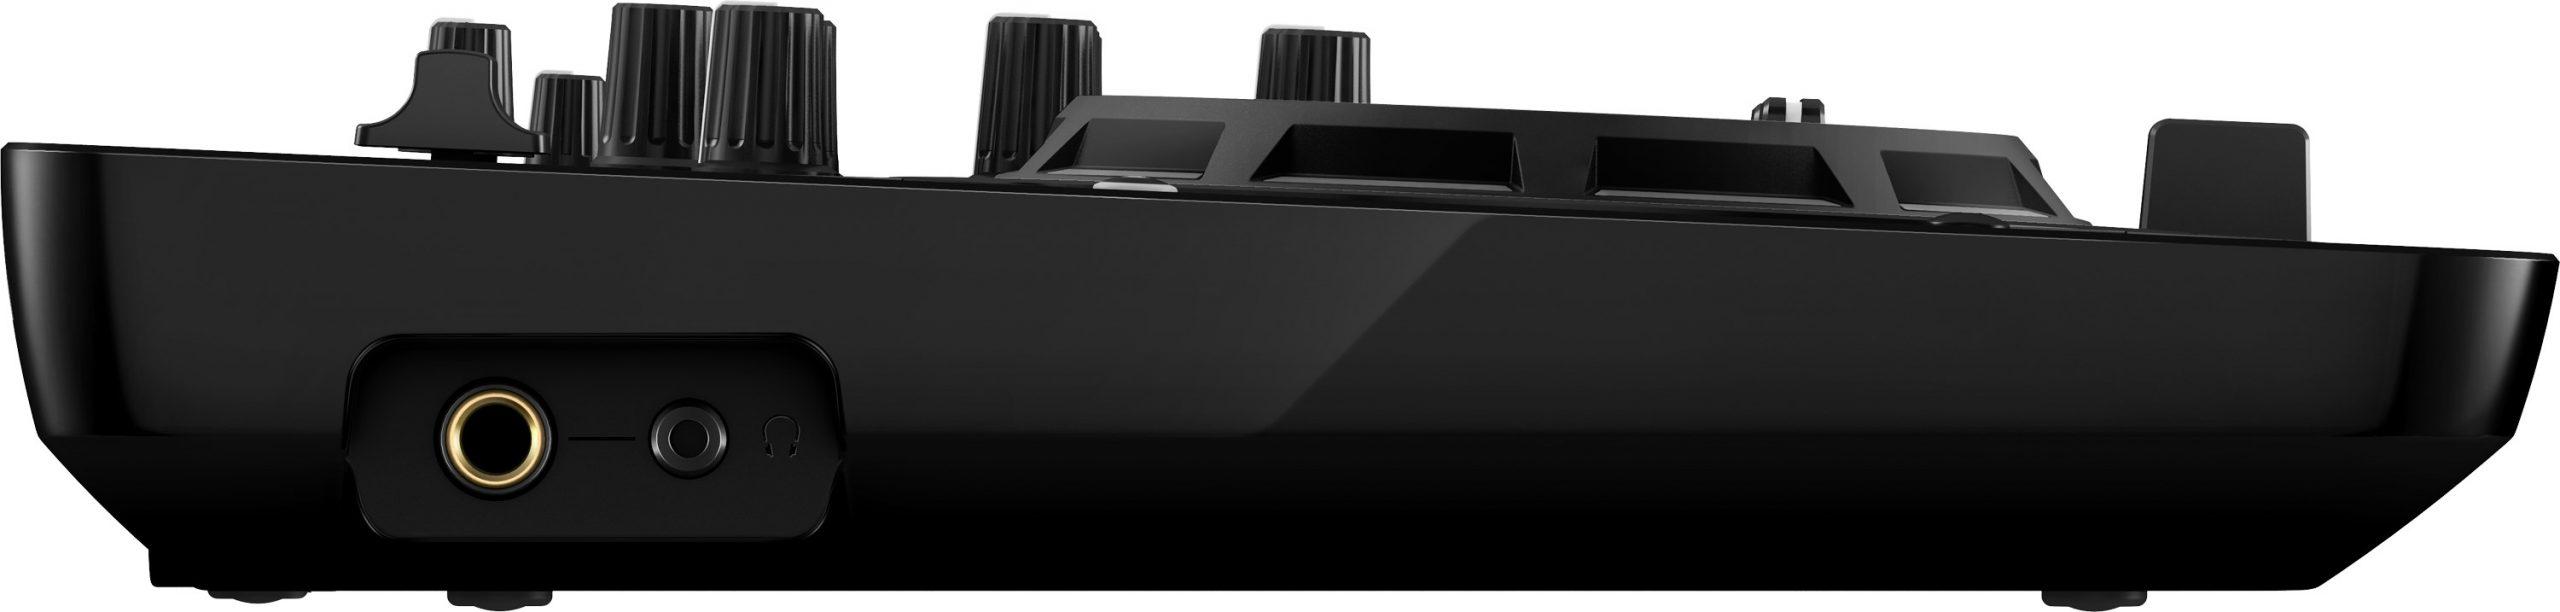 pioneer-ddj-wego4-k-consolle-dj-controller-wego-4-nero-2